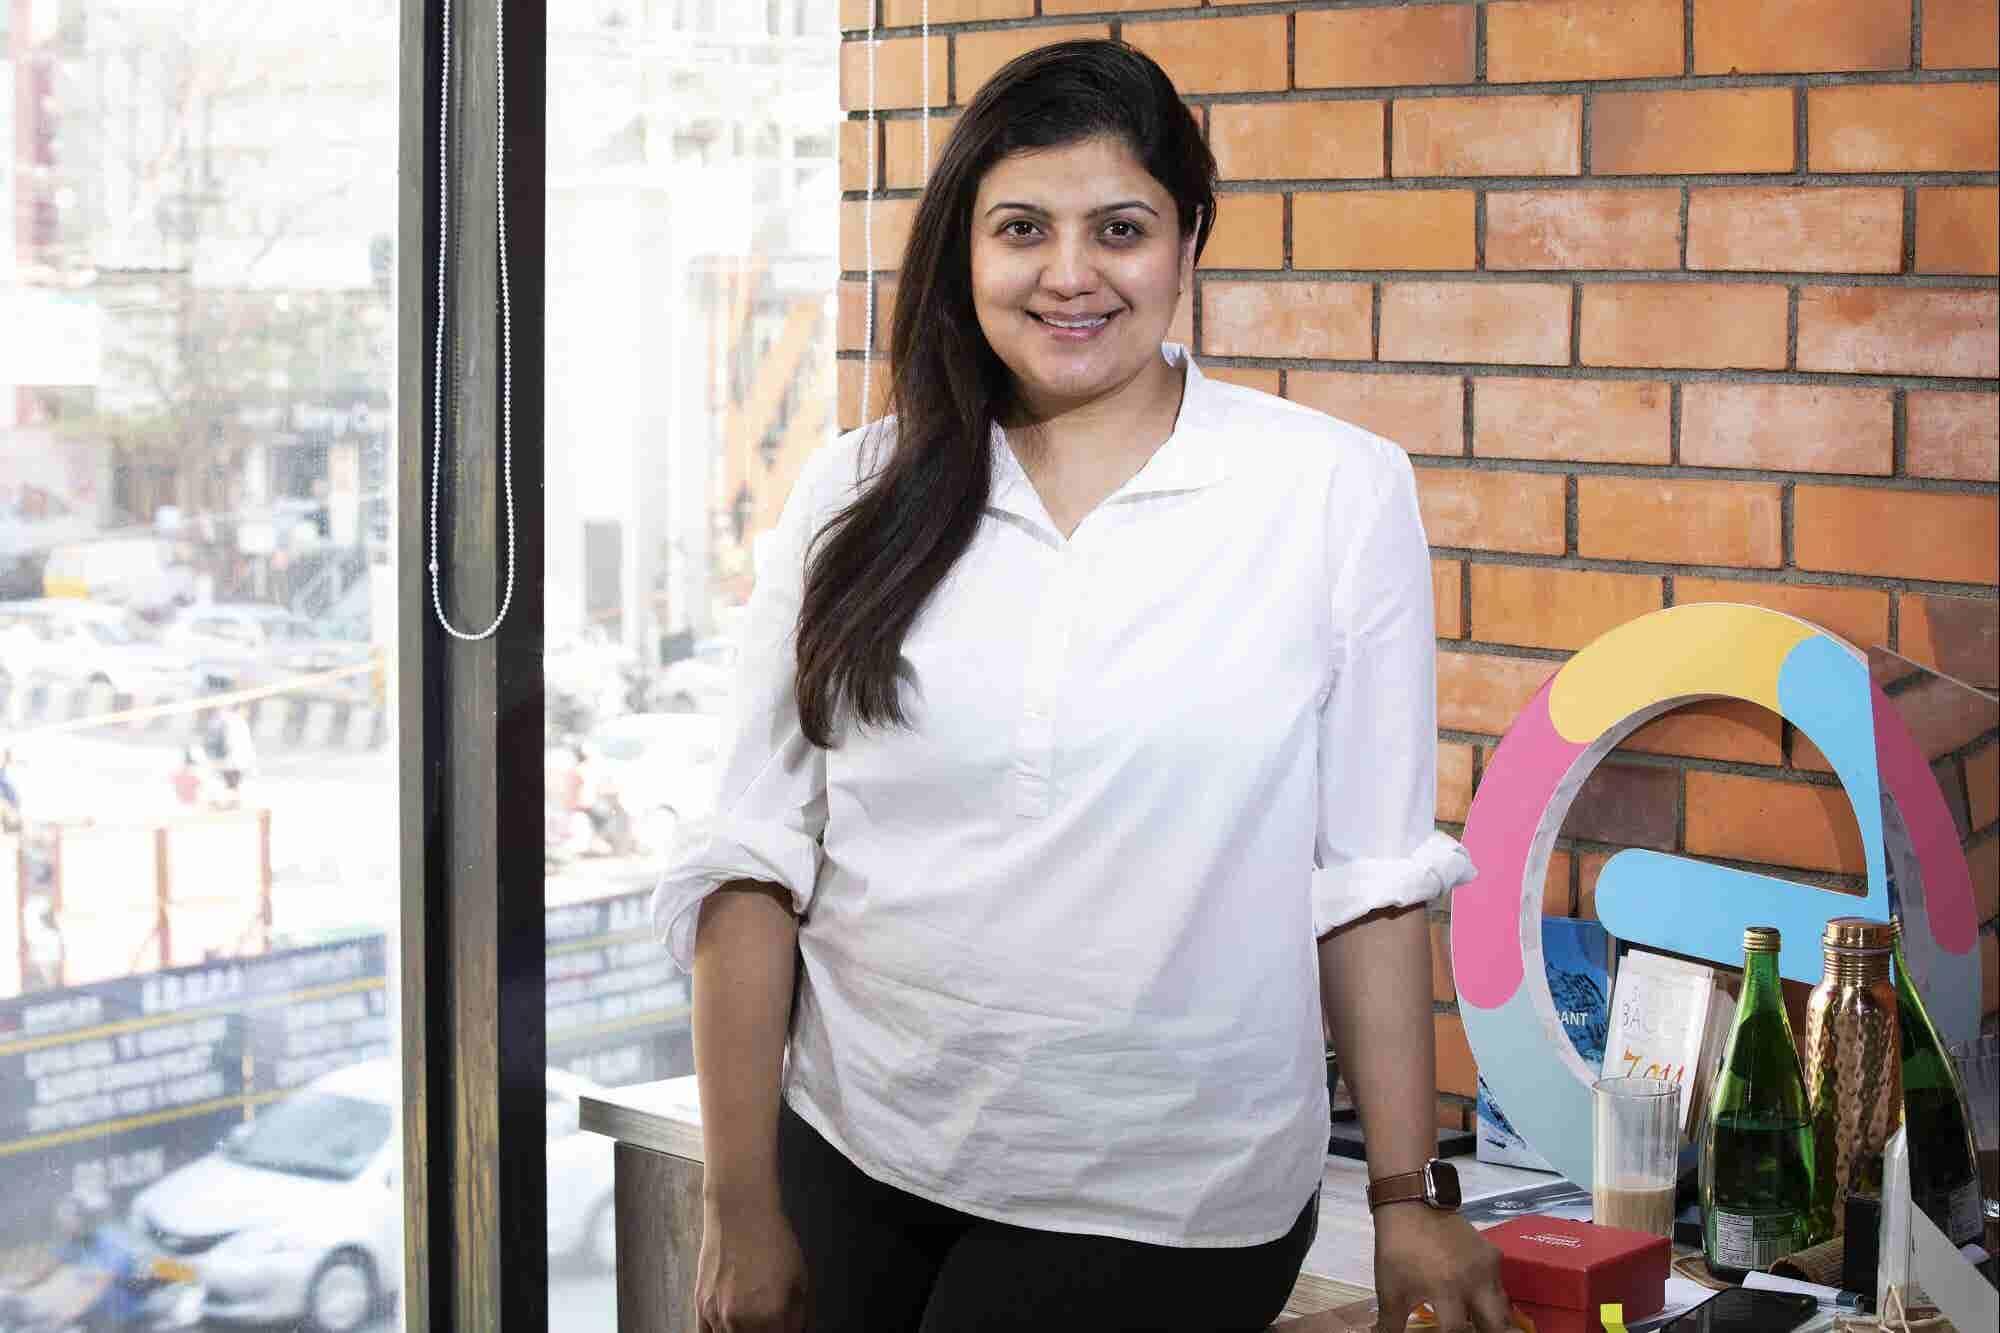 Inventing Tailor-made Courses got this Edupreneur into Entrepreneur India's Shepreneurs Class of 2019